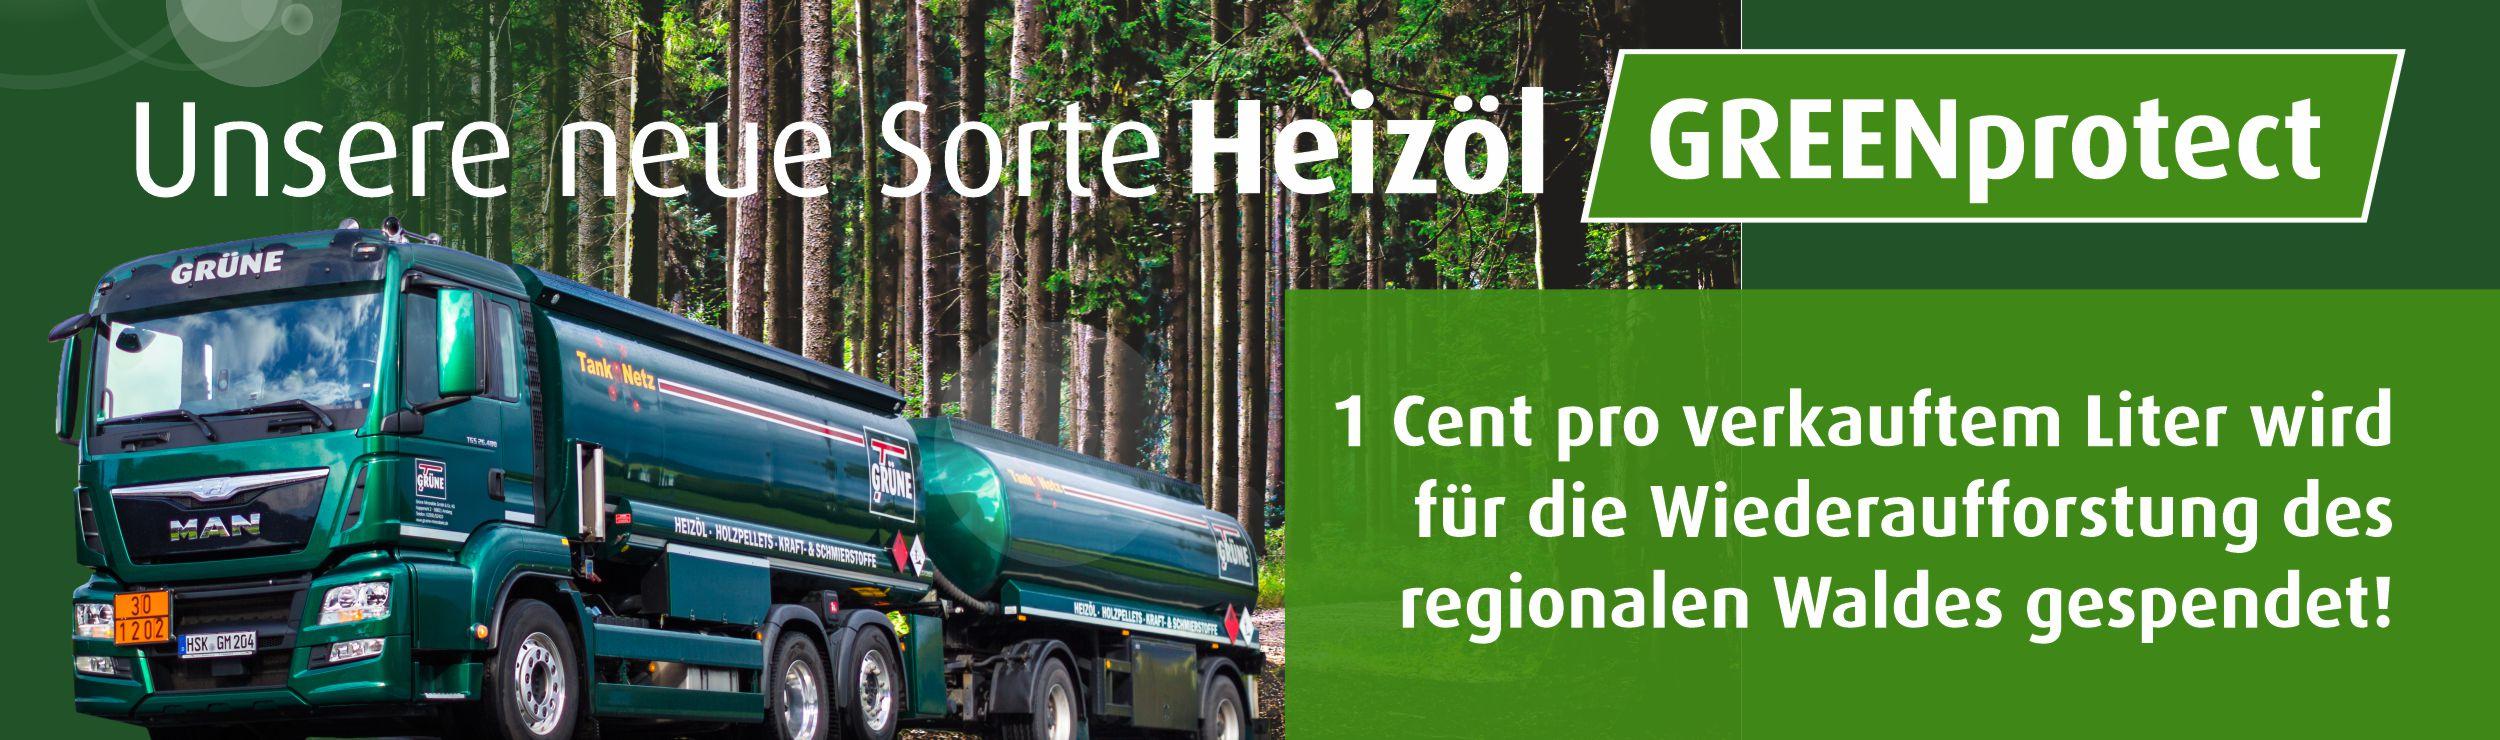 slider_motiv_heizoel_green_protect